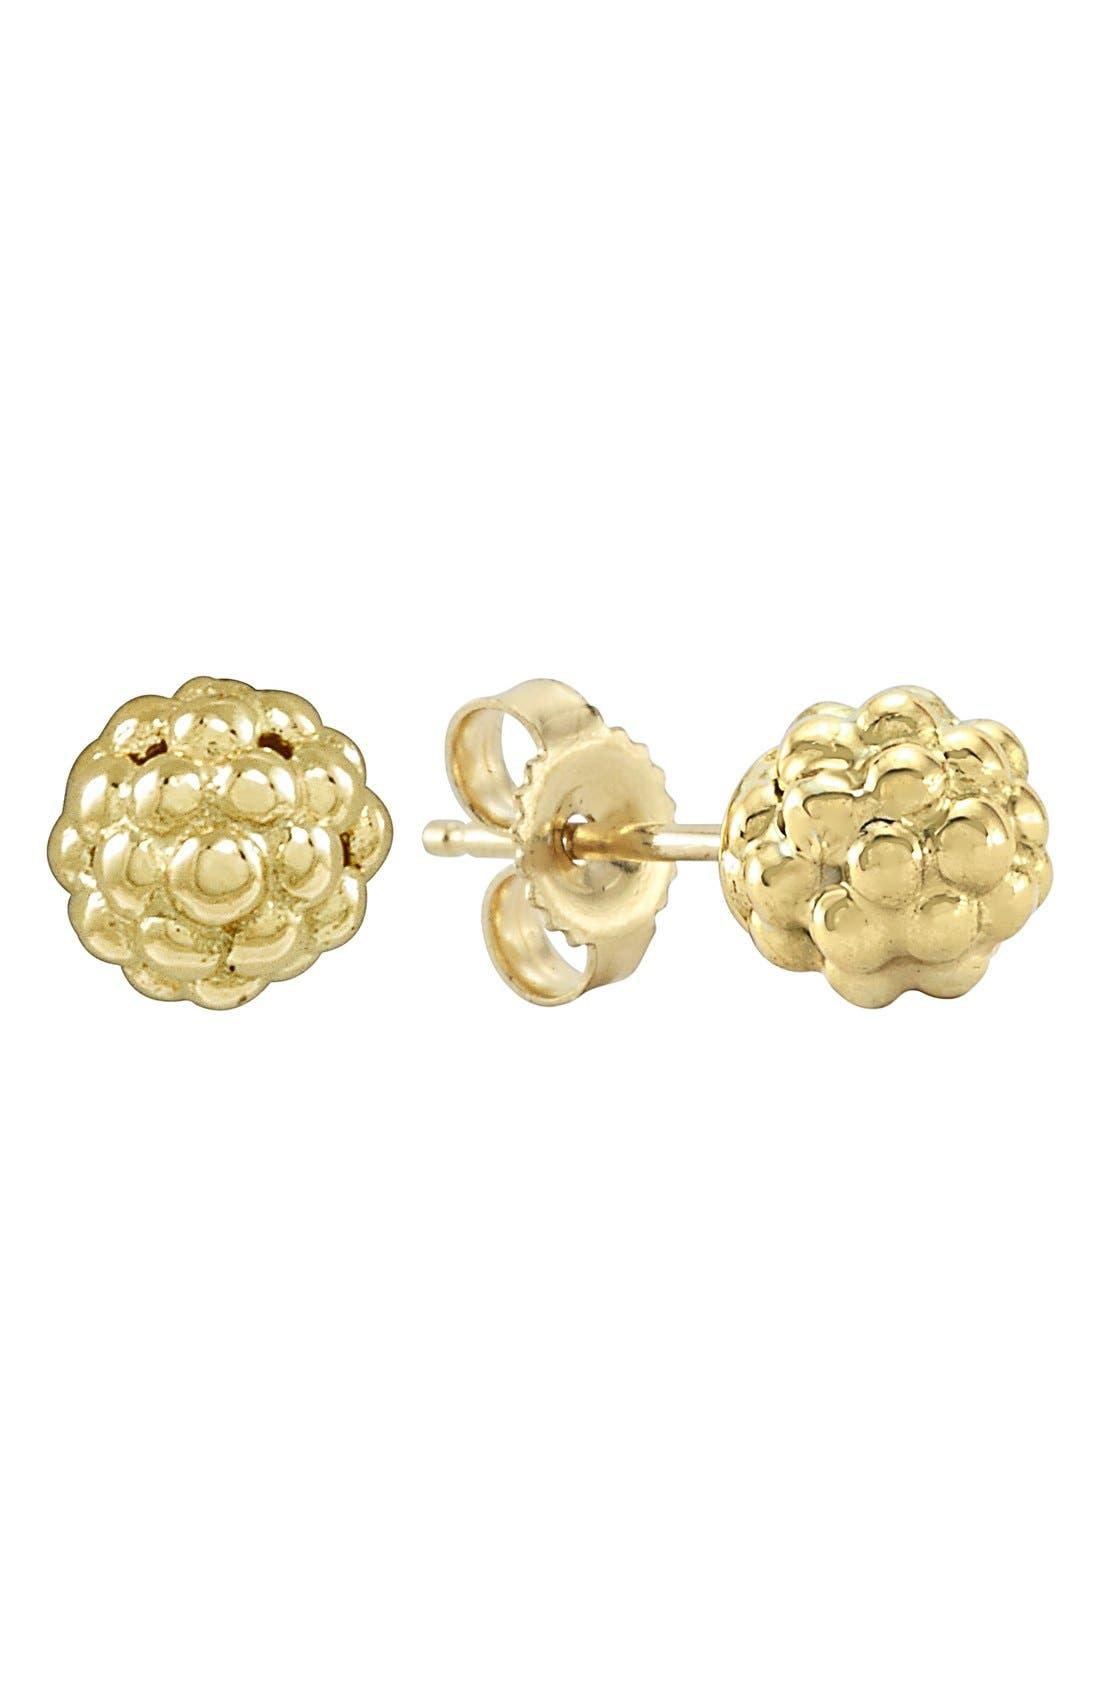 LAGOS 'Caviar Icon' Stud Earrings